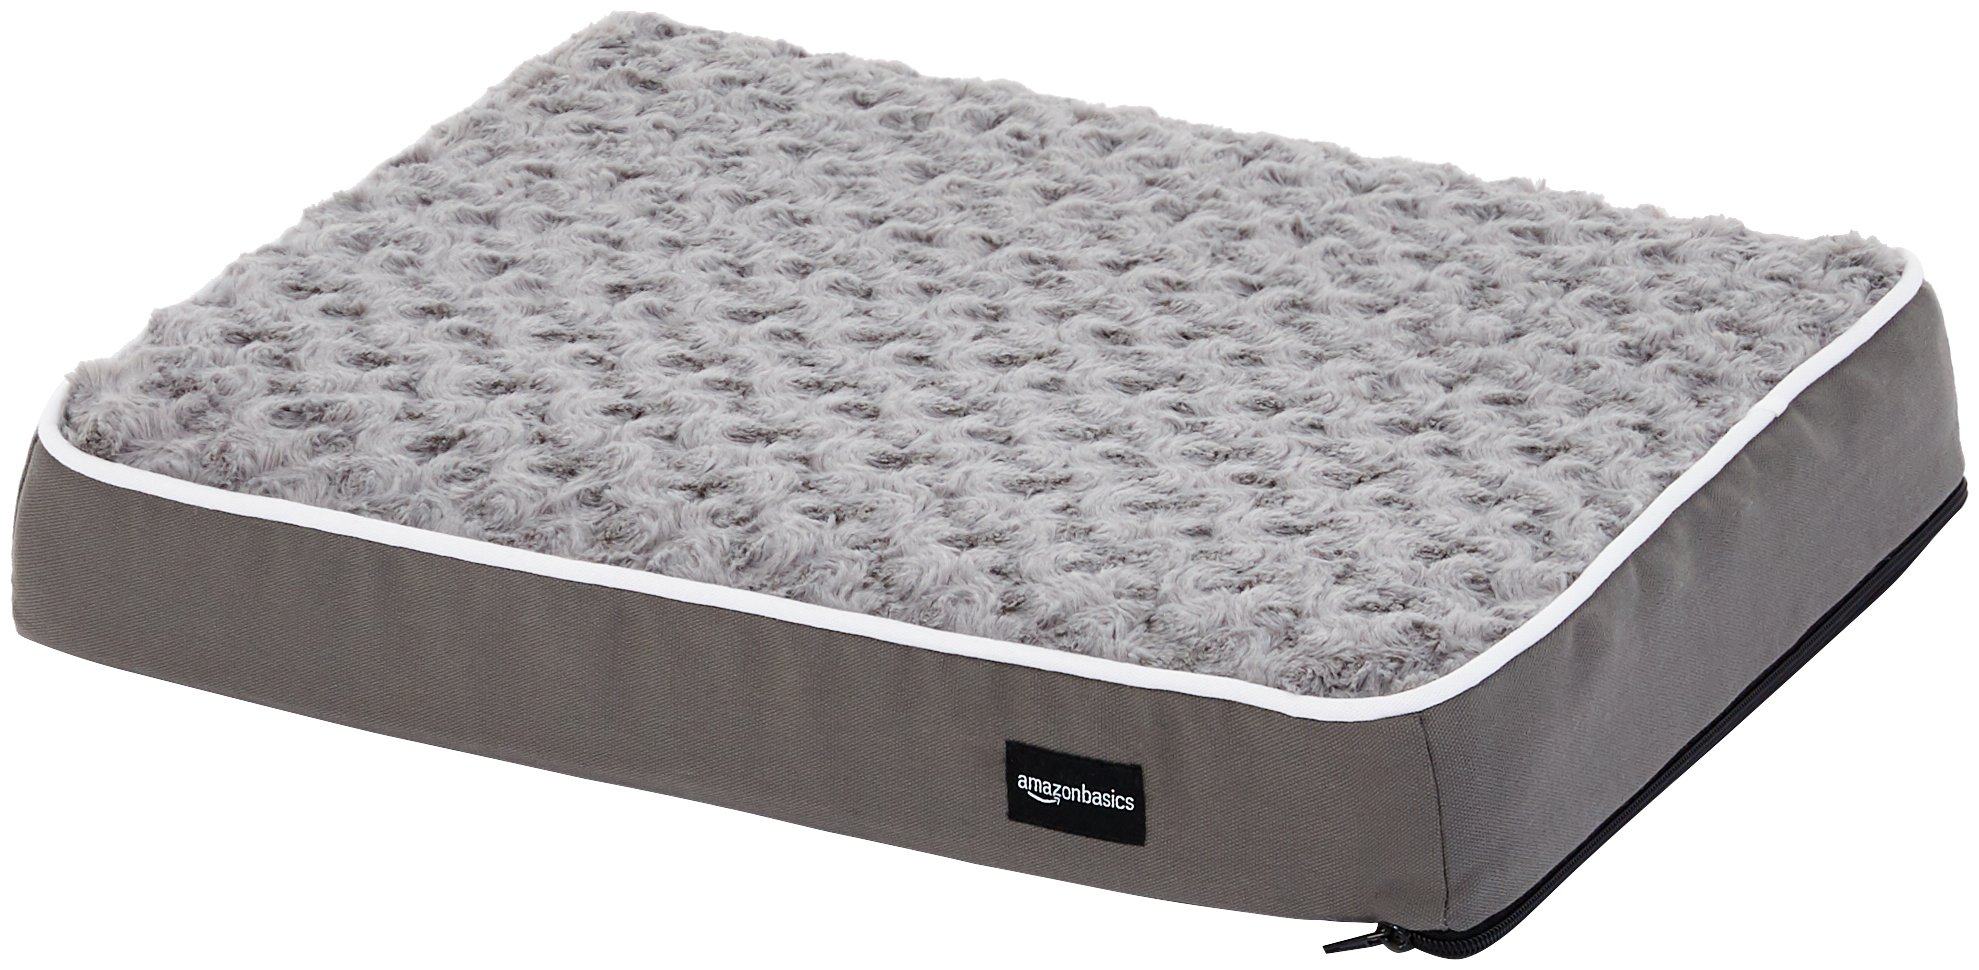 AmazonBasics Ergonomic Foam Pet Bed For Cats or Dogs 3